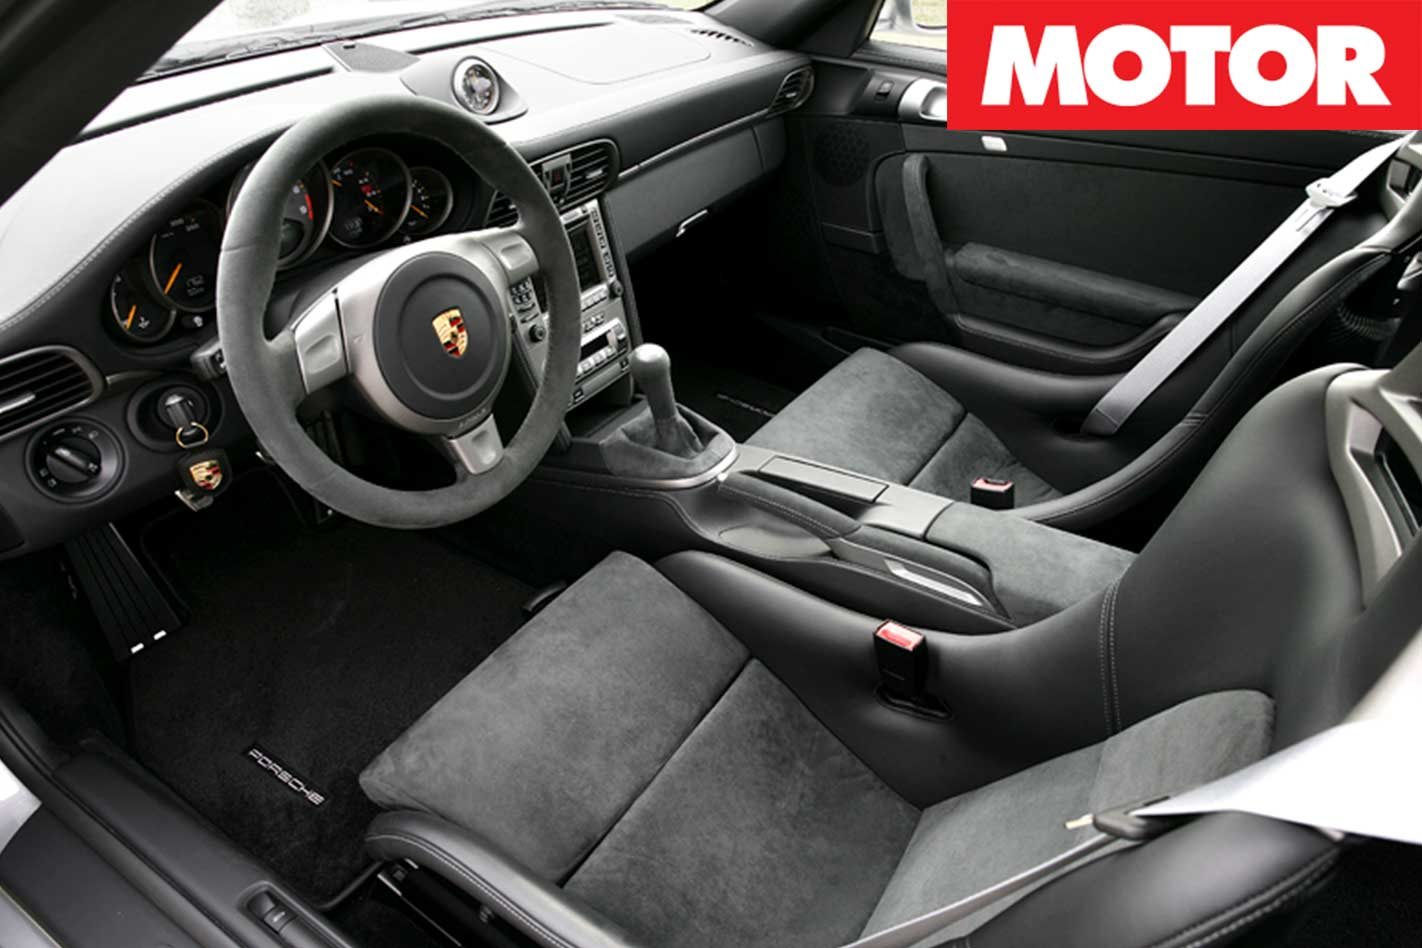 2006 porsche 911 gt3 review classic motor. Black Bedroom Furniture Sets. Home Design Ideas